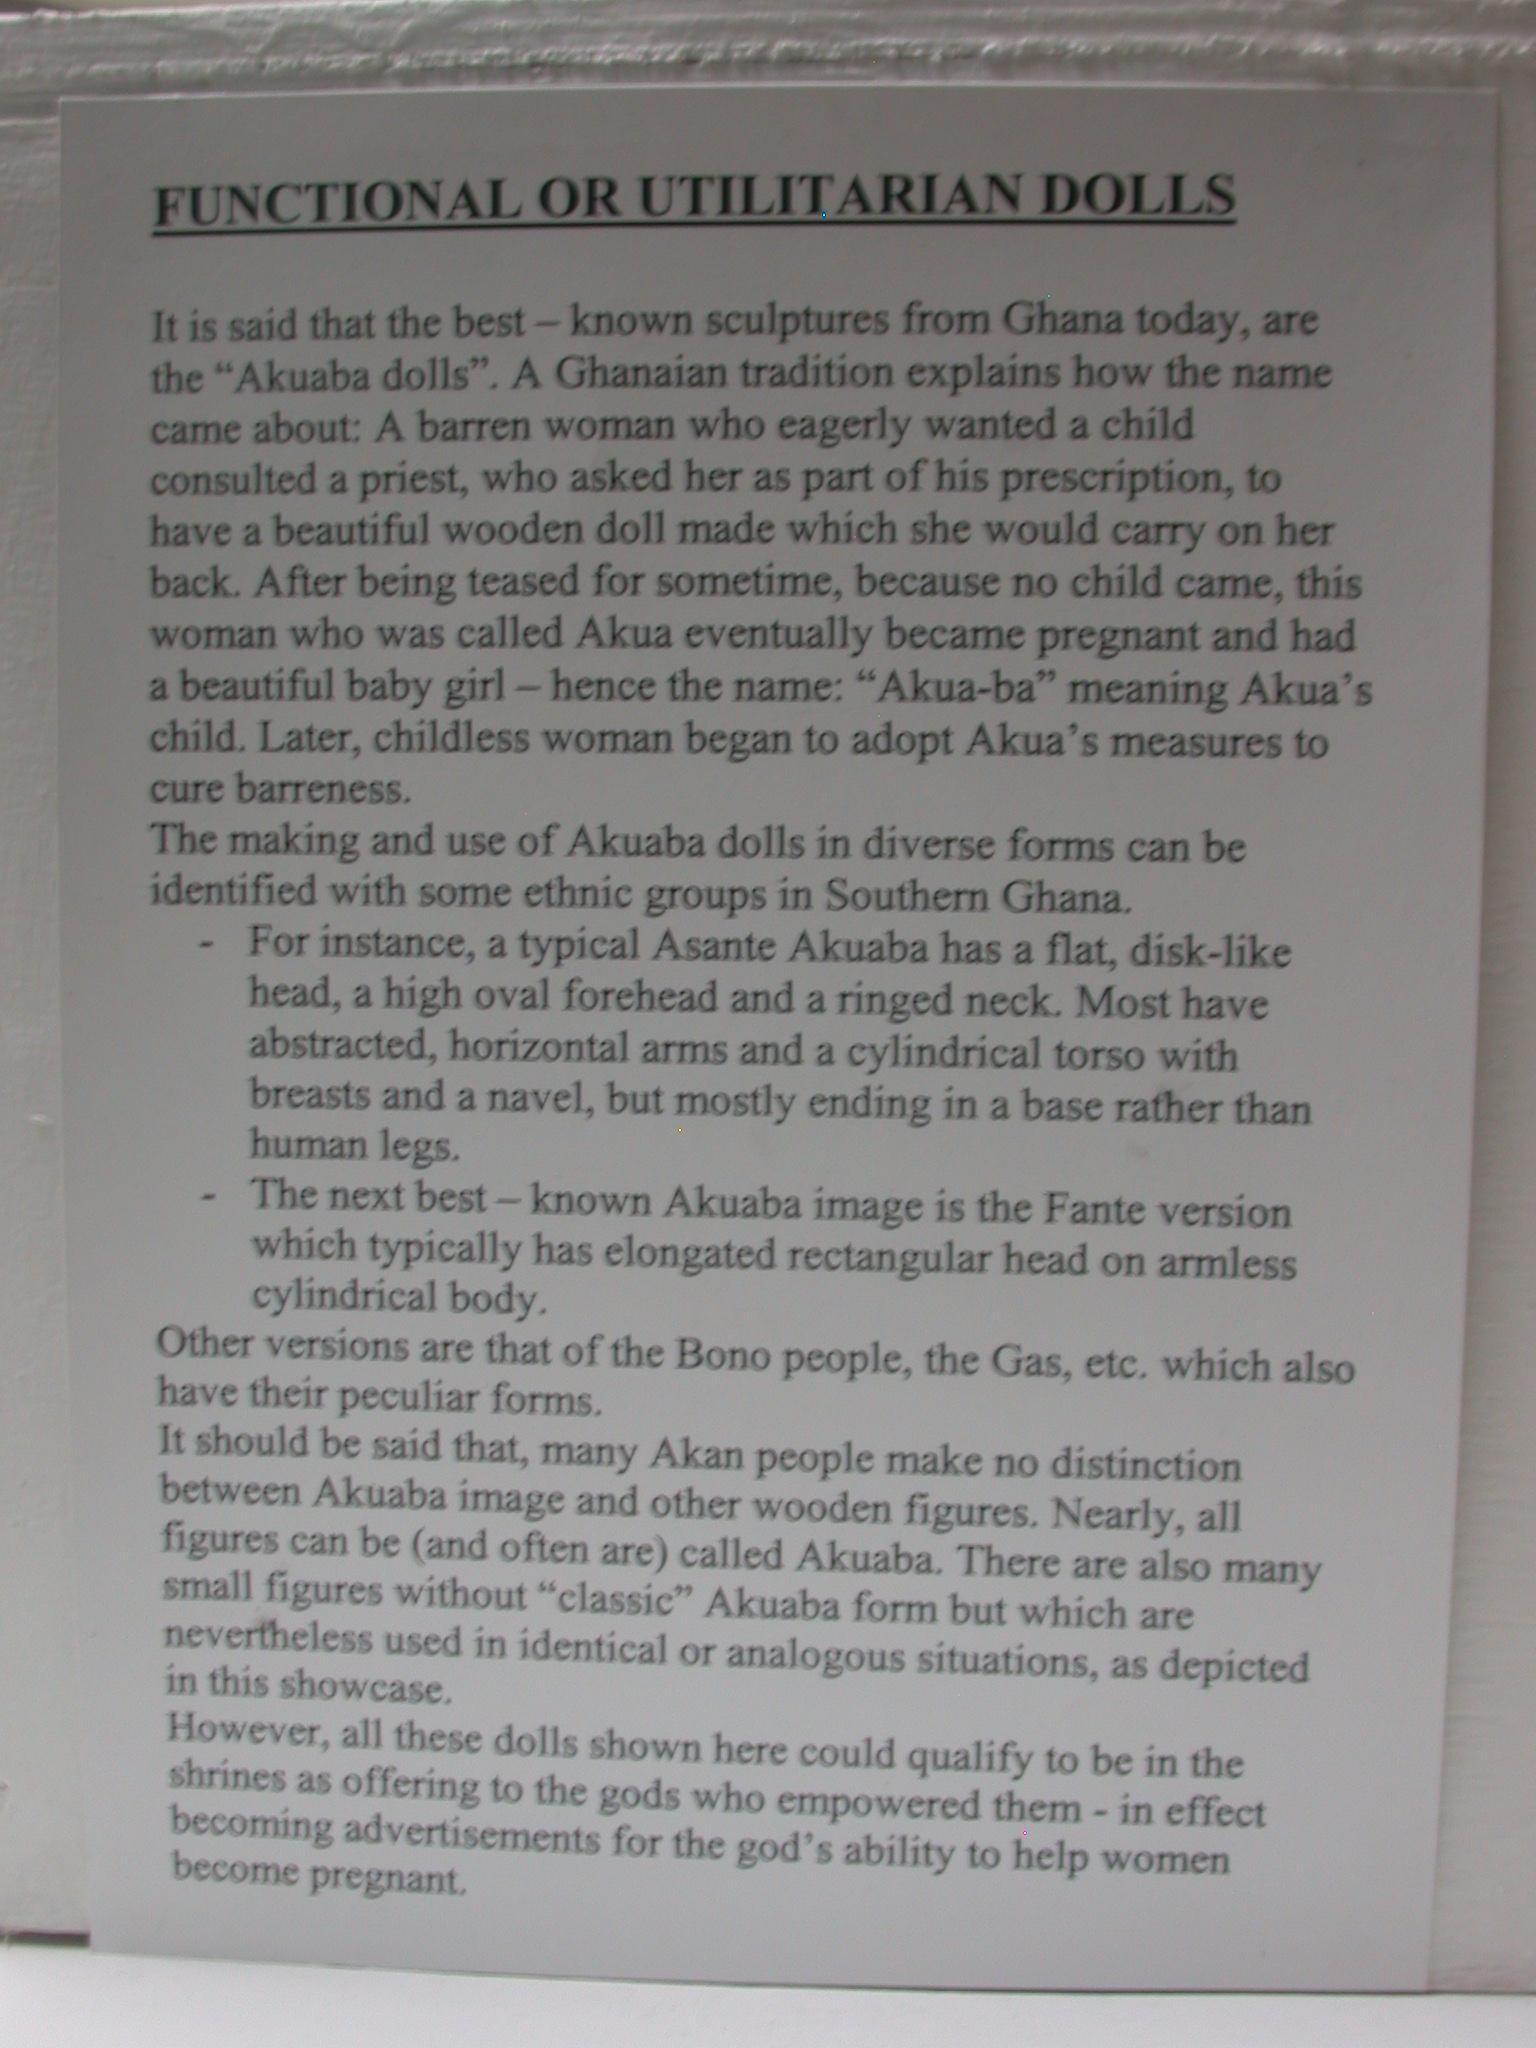 Description of Functional or Utilitarian Dolls, Akuaba or Akweba Dolls, National Museum, Accra, Ghana